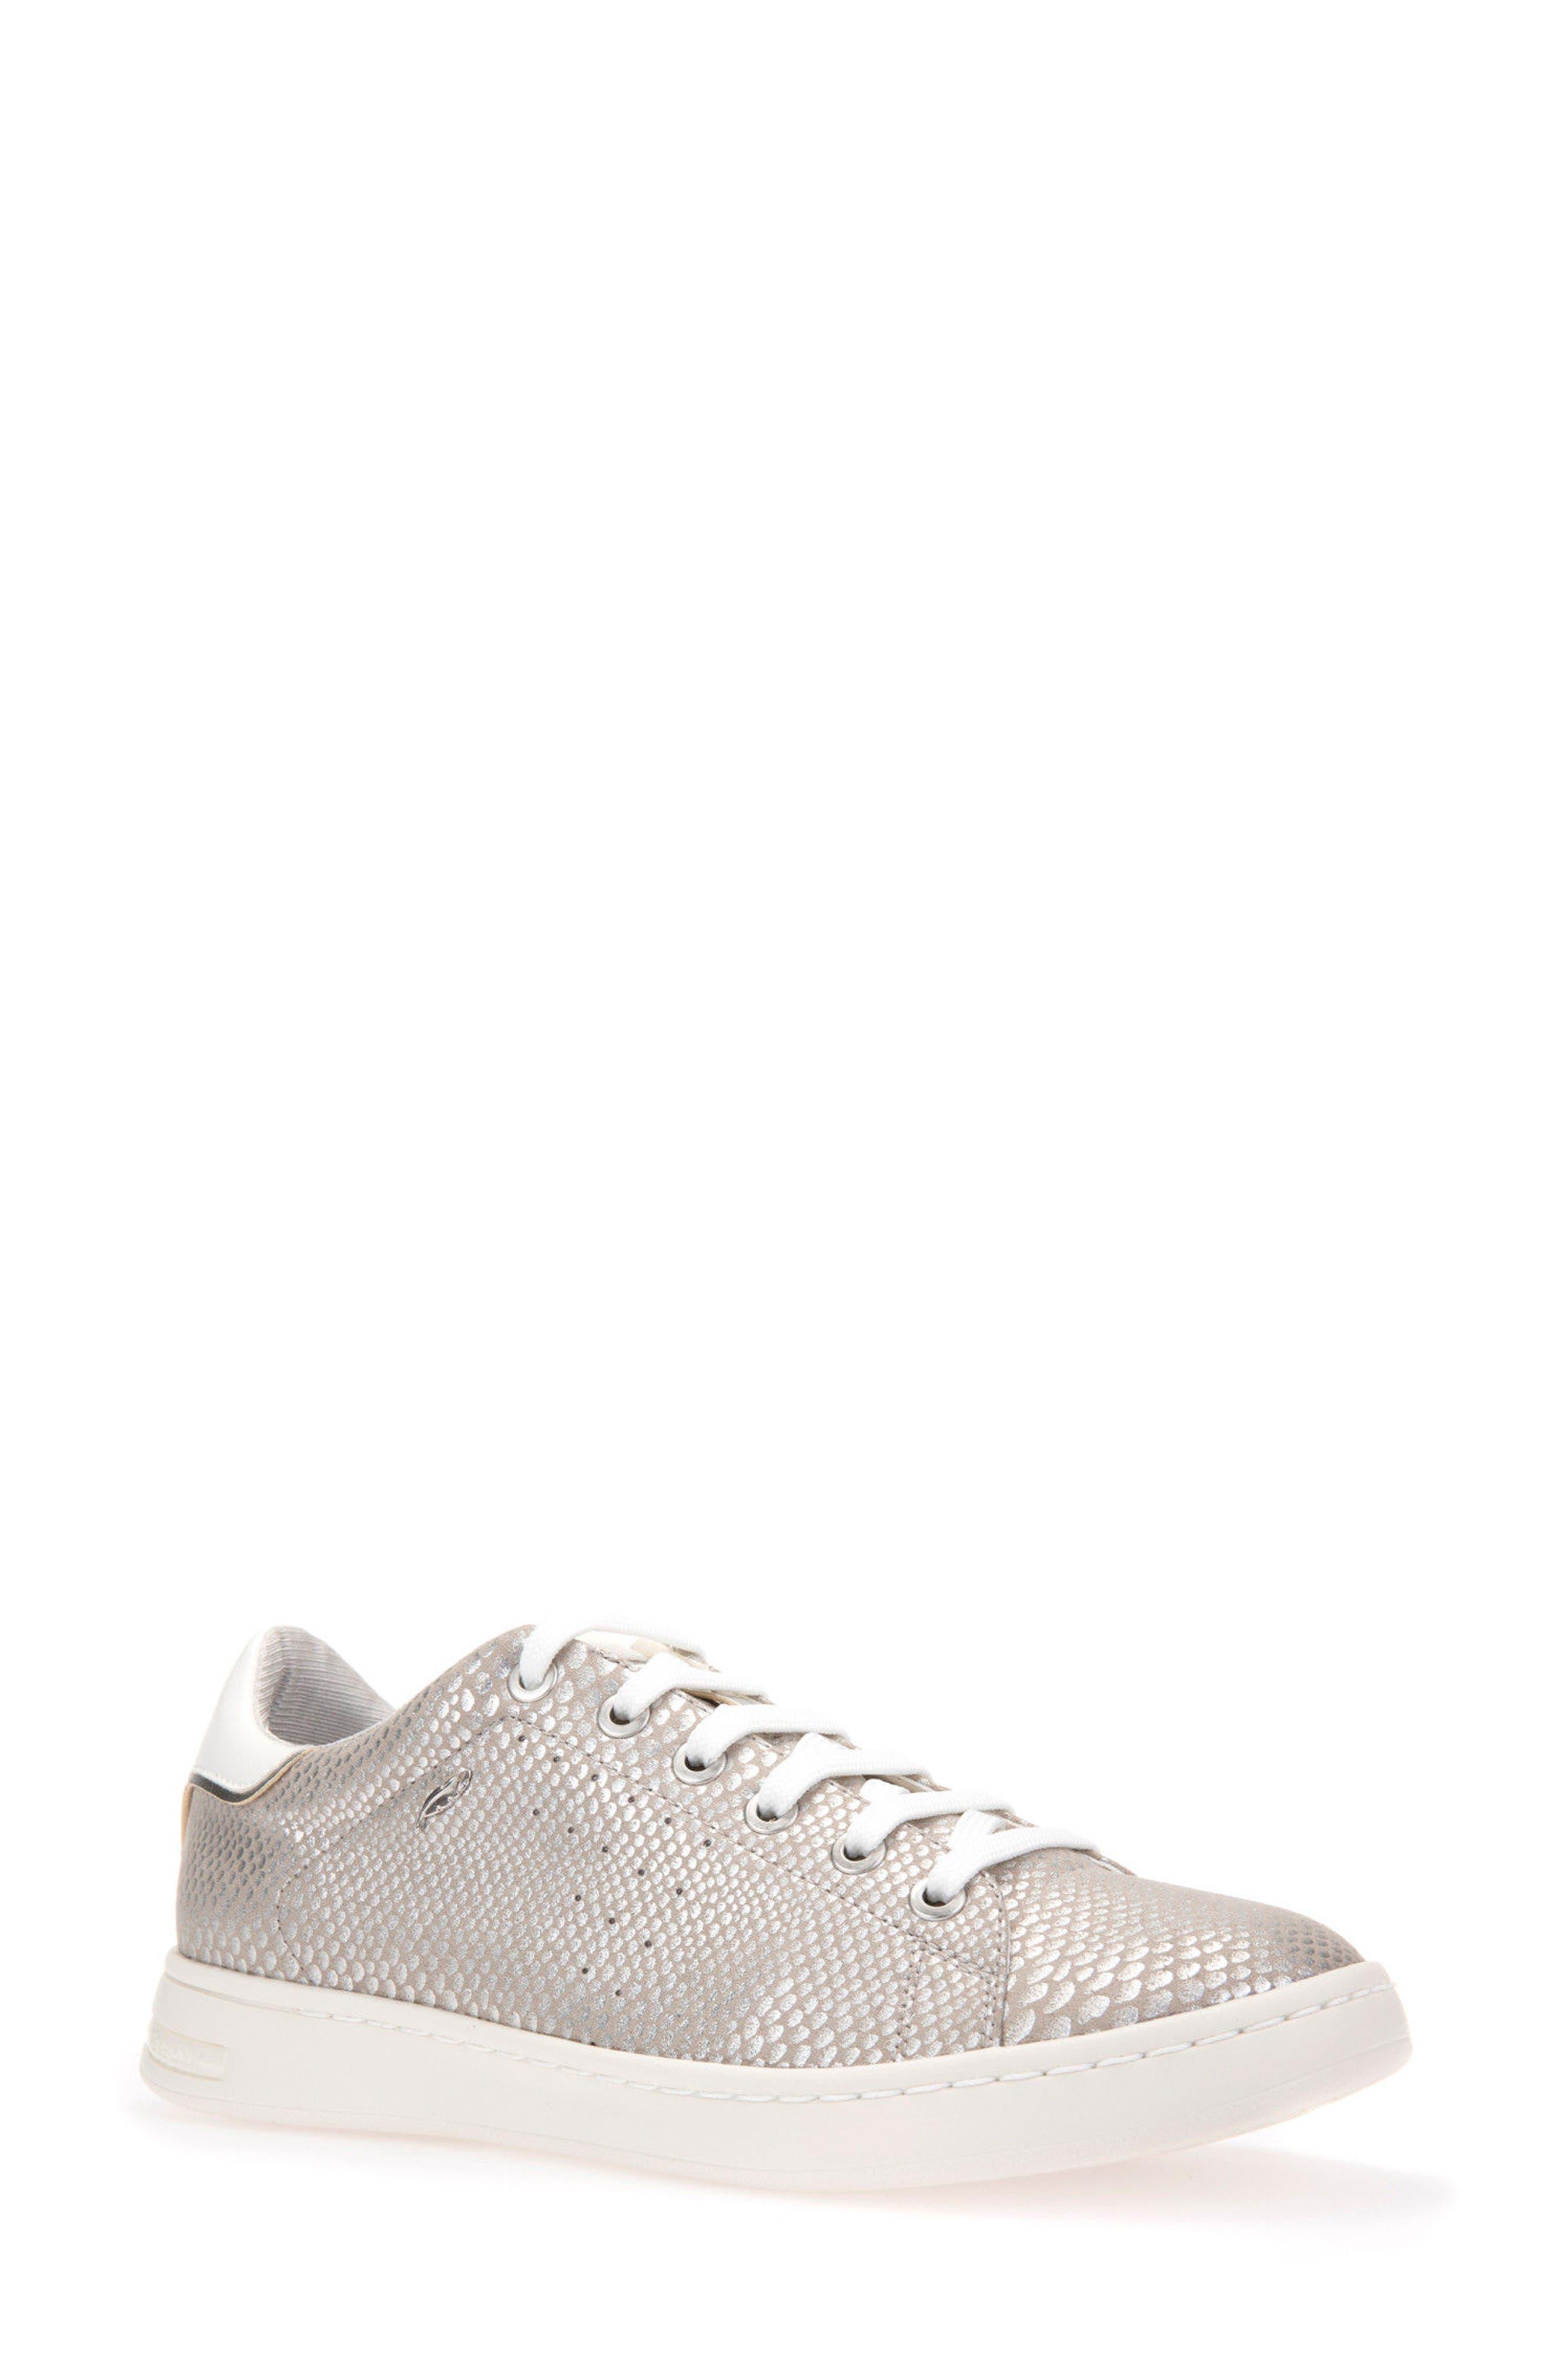 Jaysen Sneaker,                         Main,                         color, SILVER FABRIC